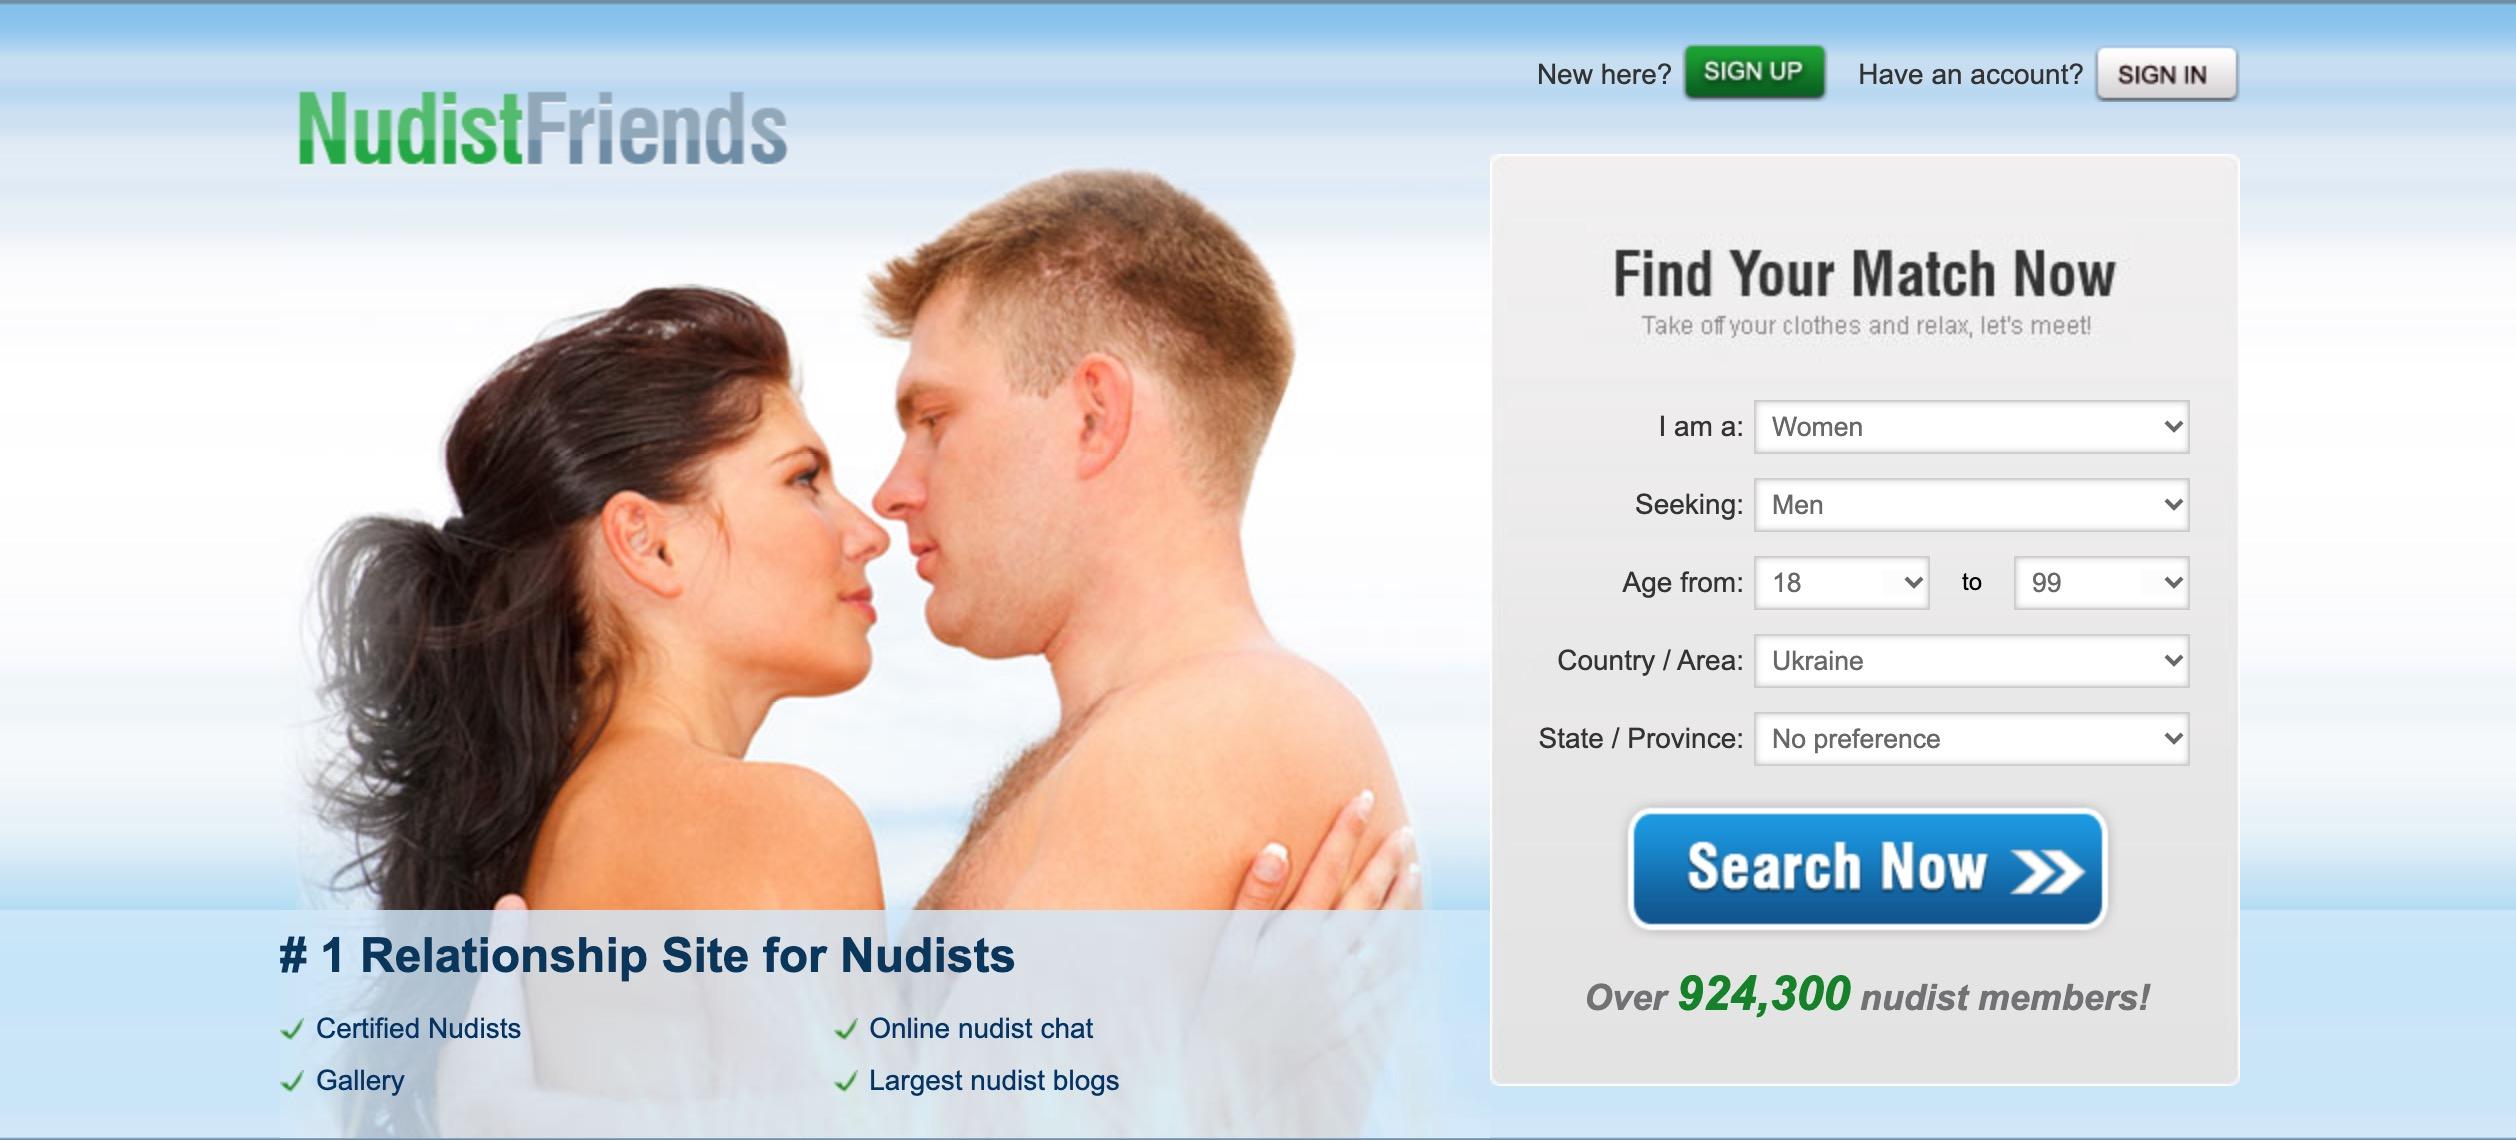 NudistFriends main page